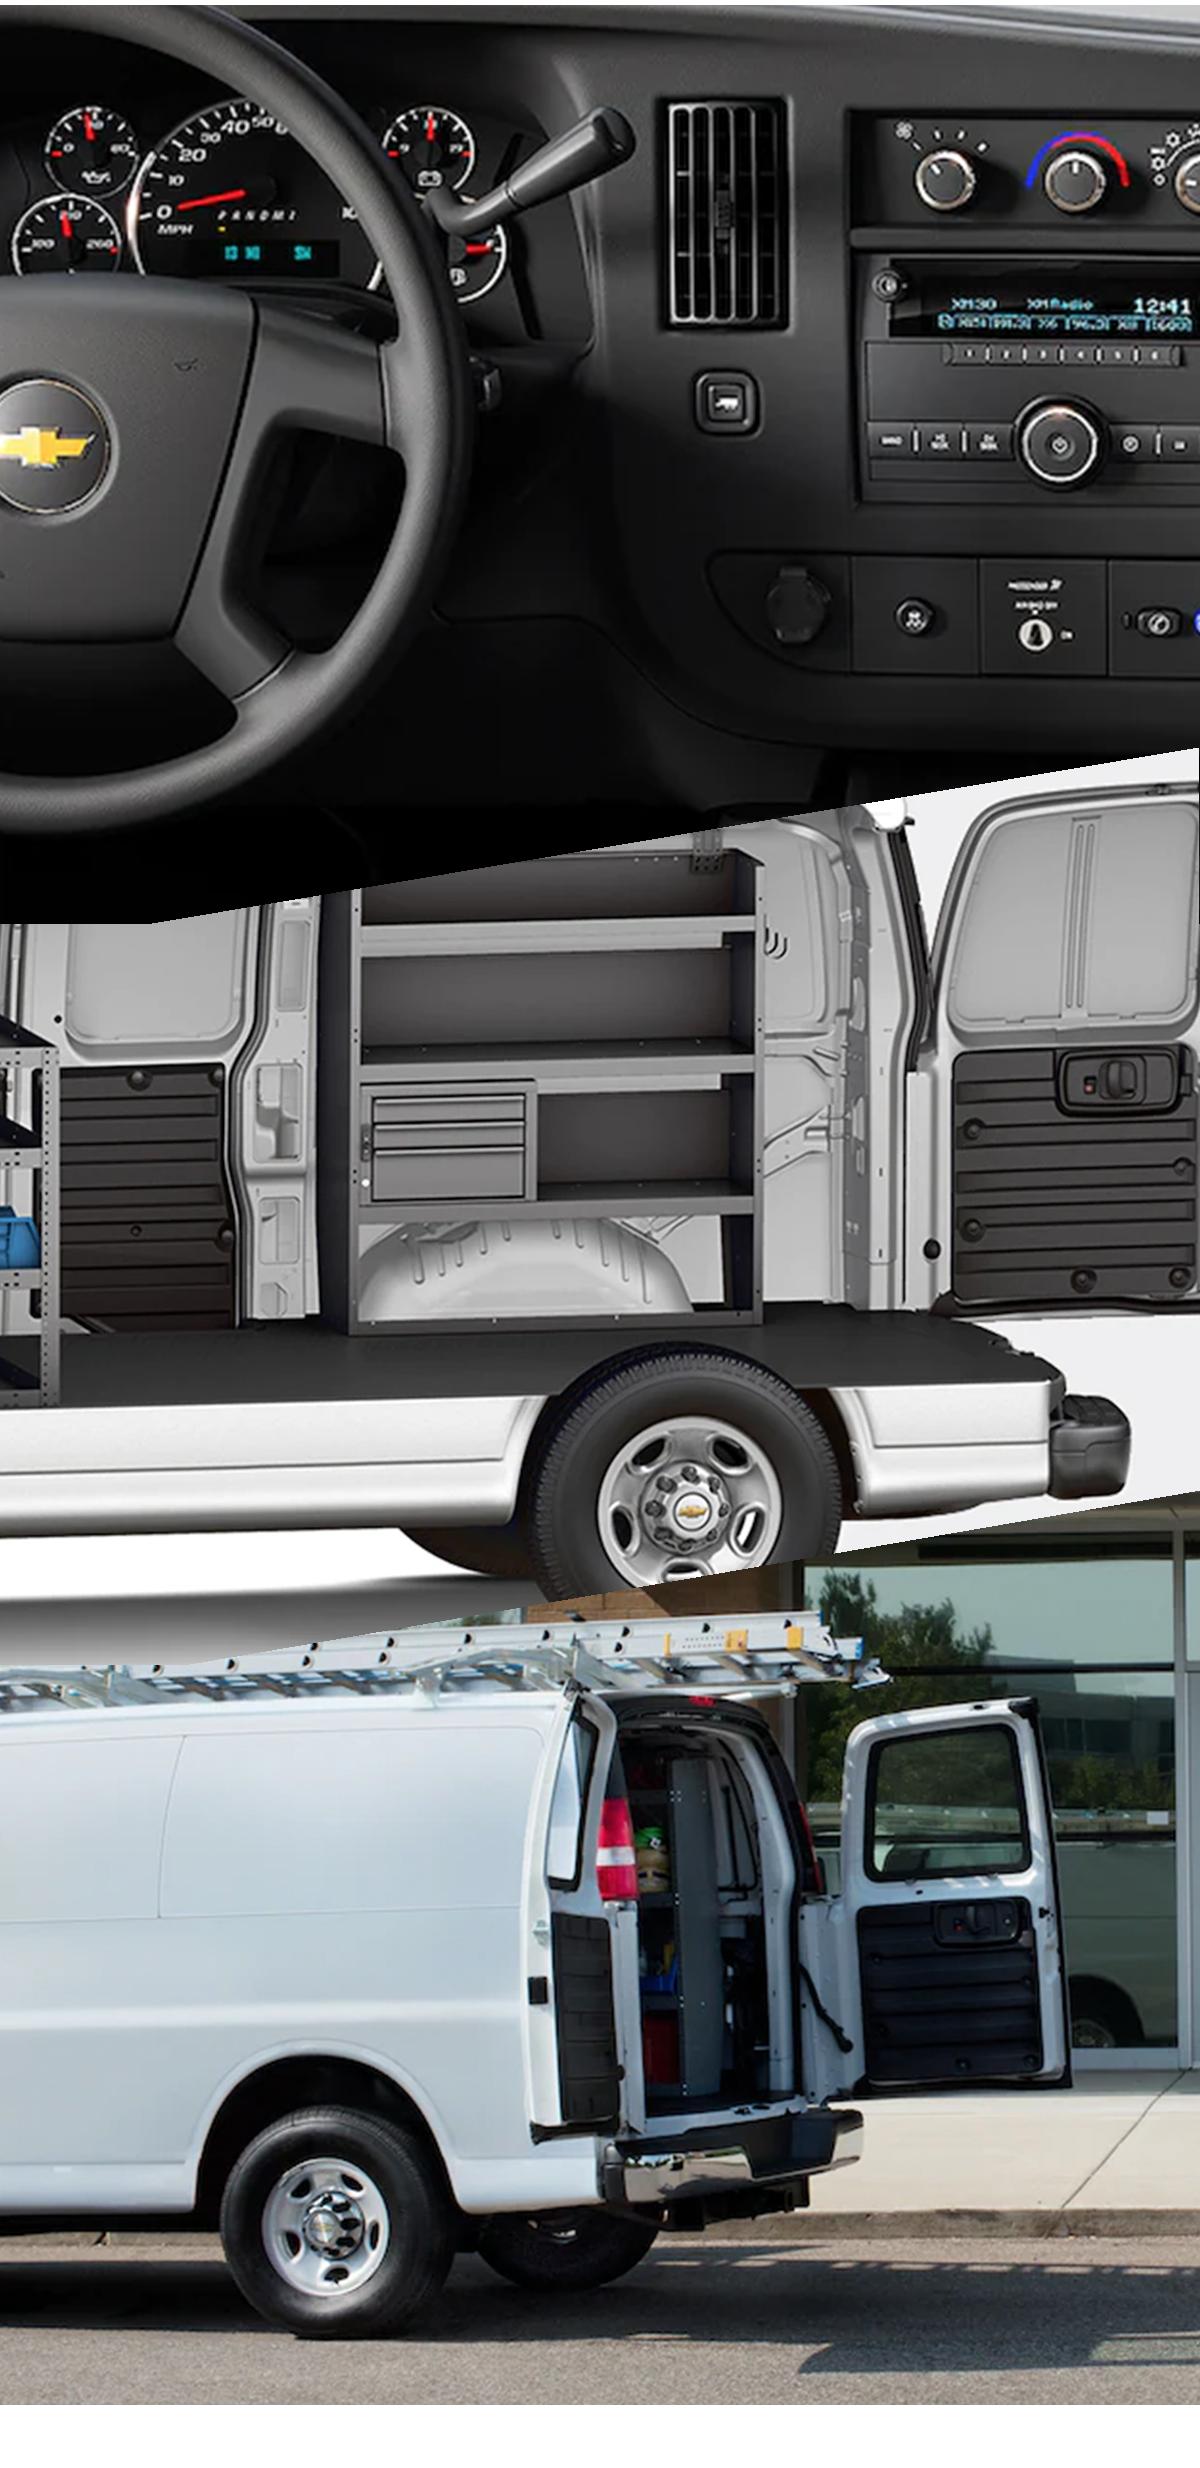 2021 Chevy Express Van Interior